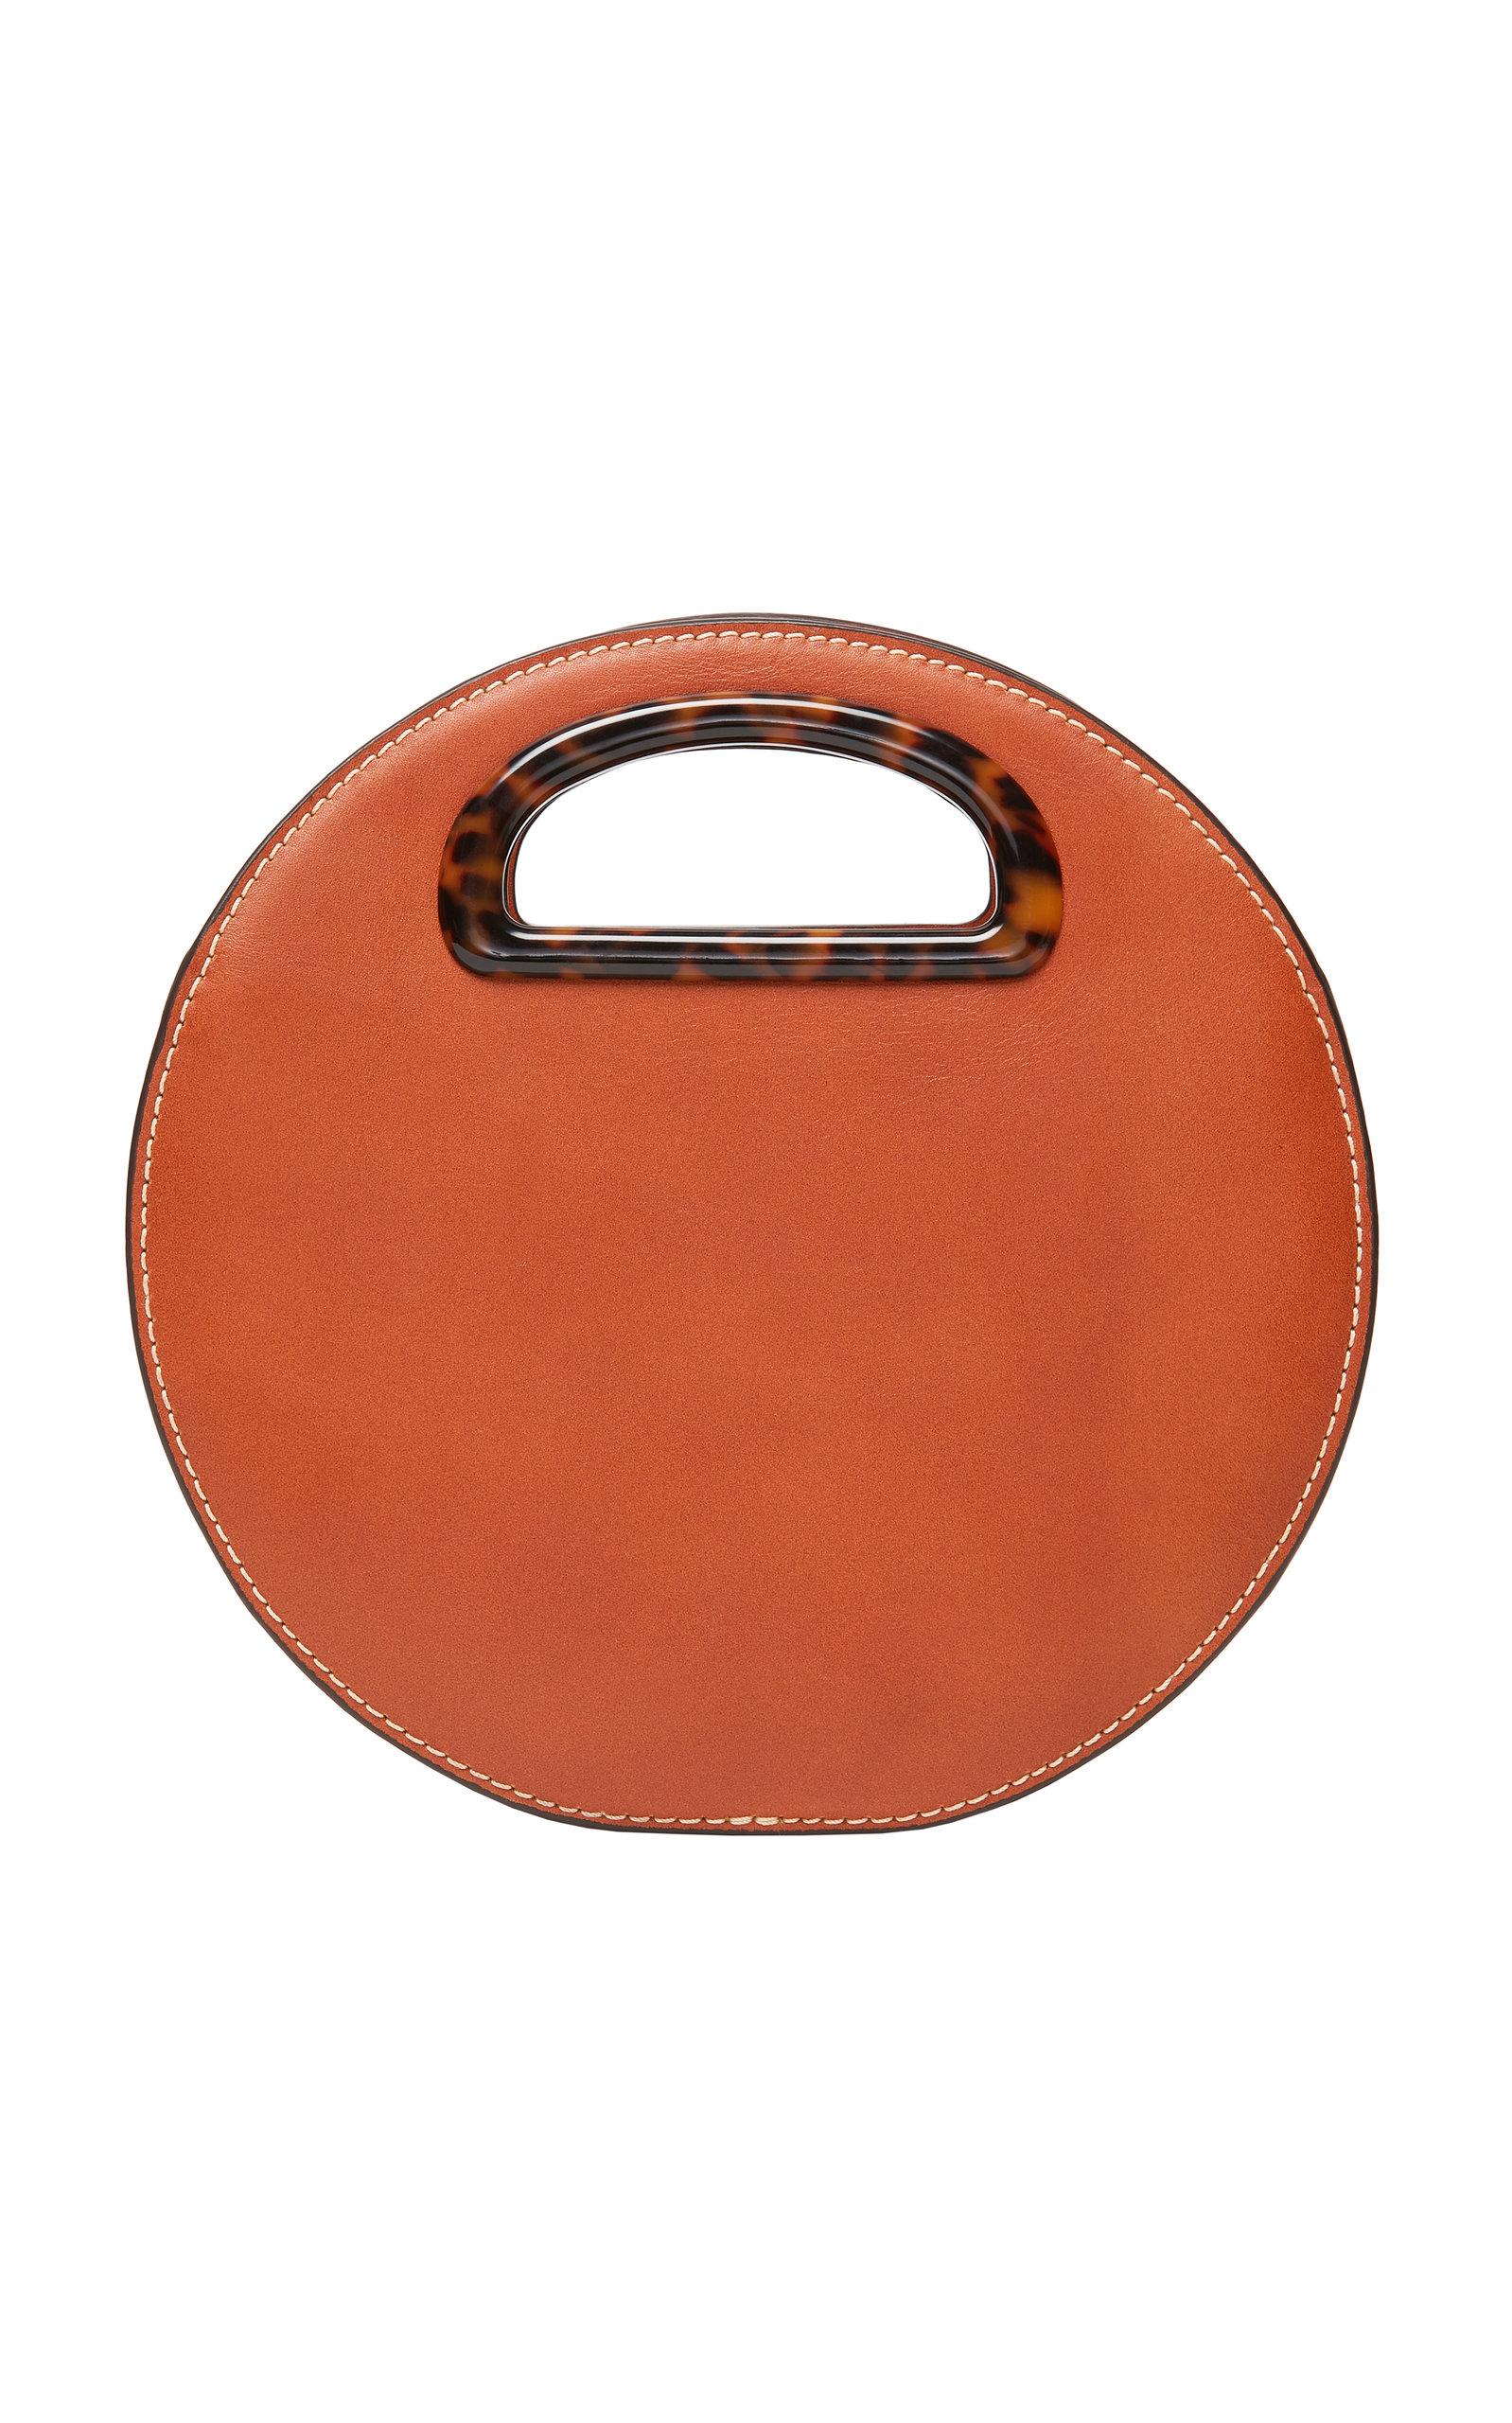 Loeffler Randall Crossbody Indy Circle Leather Crossbody Bag